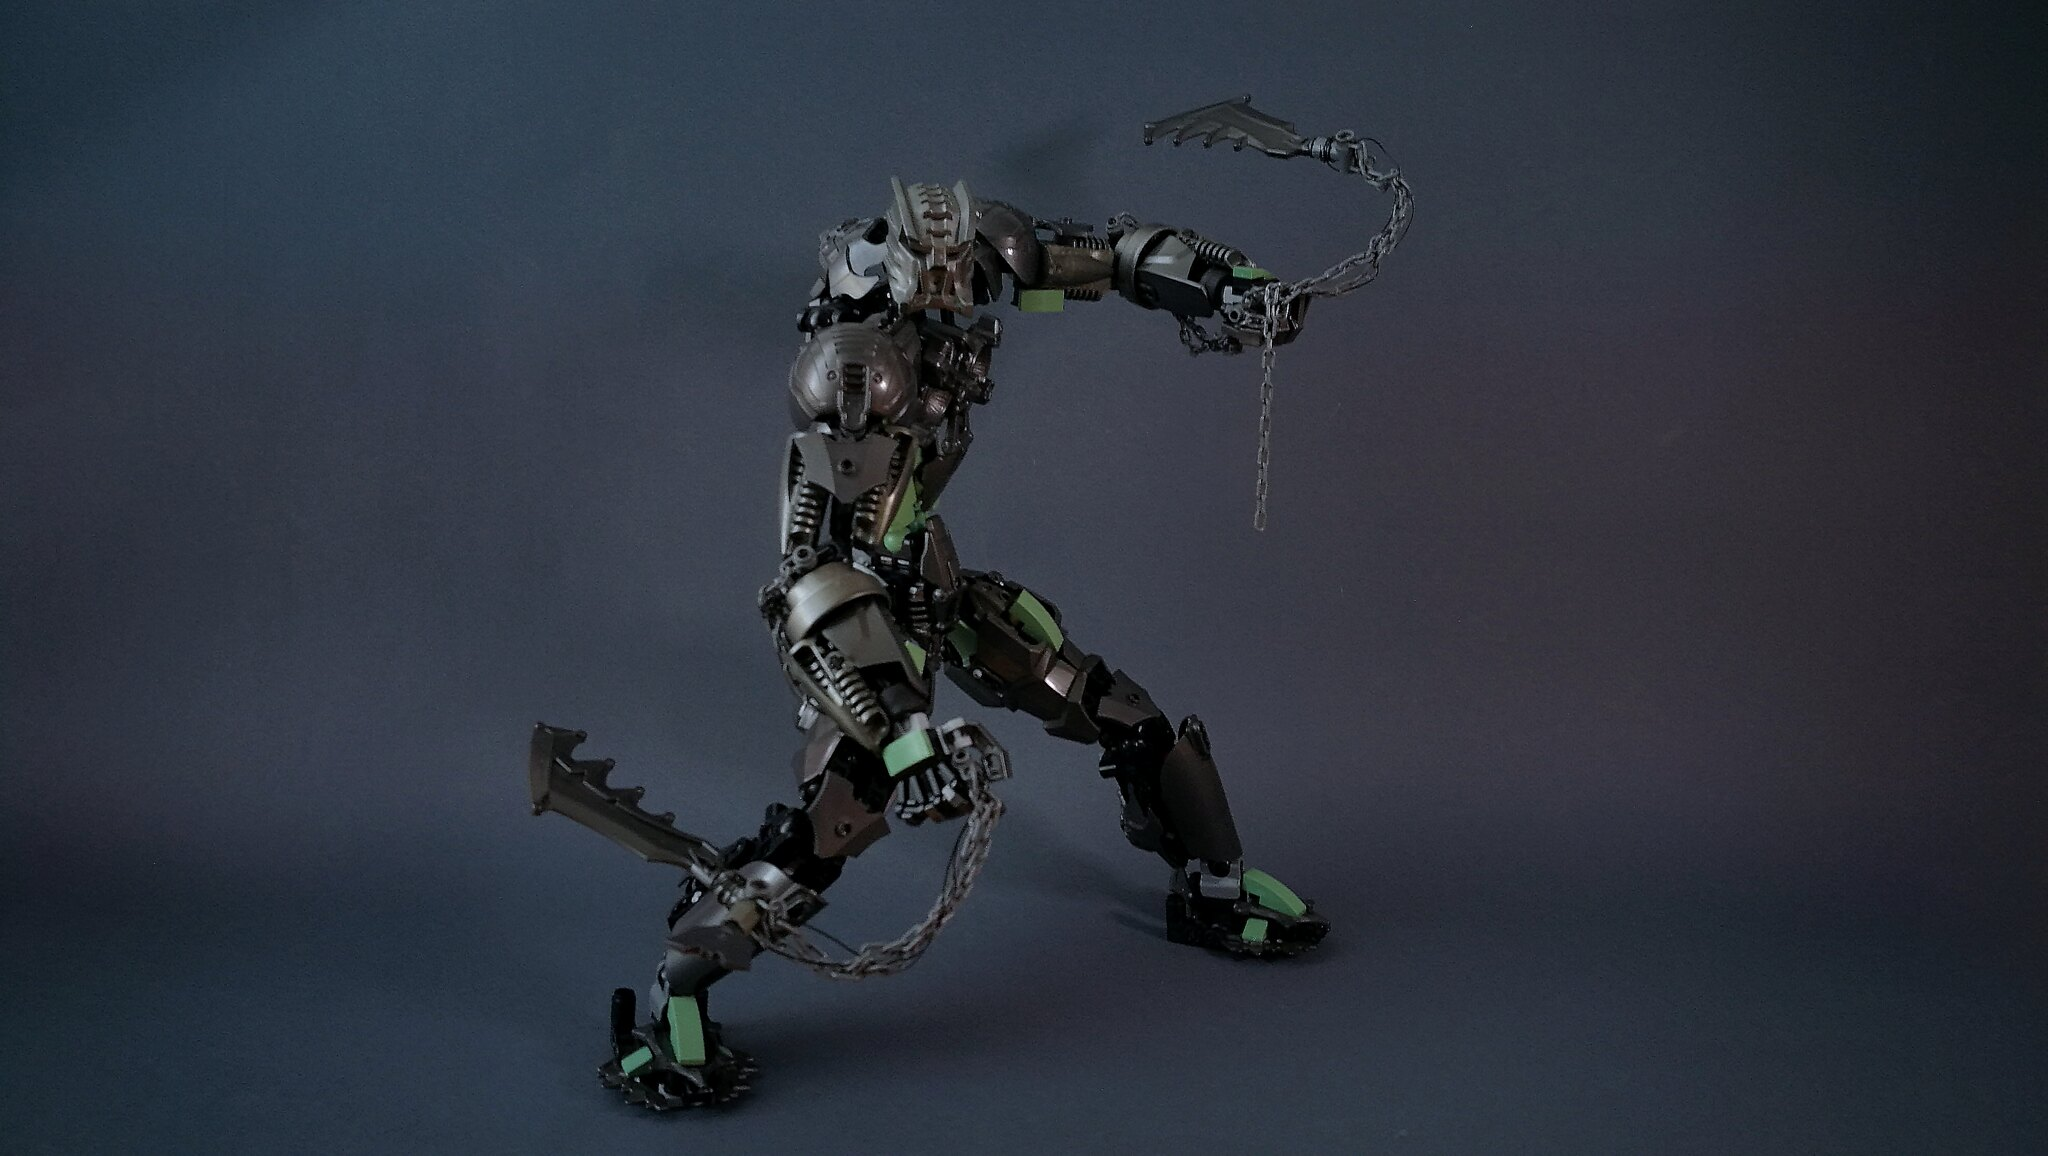 Phobus - Champion of the Arena